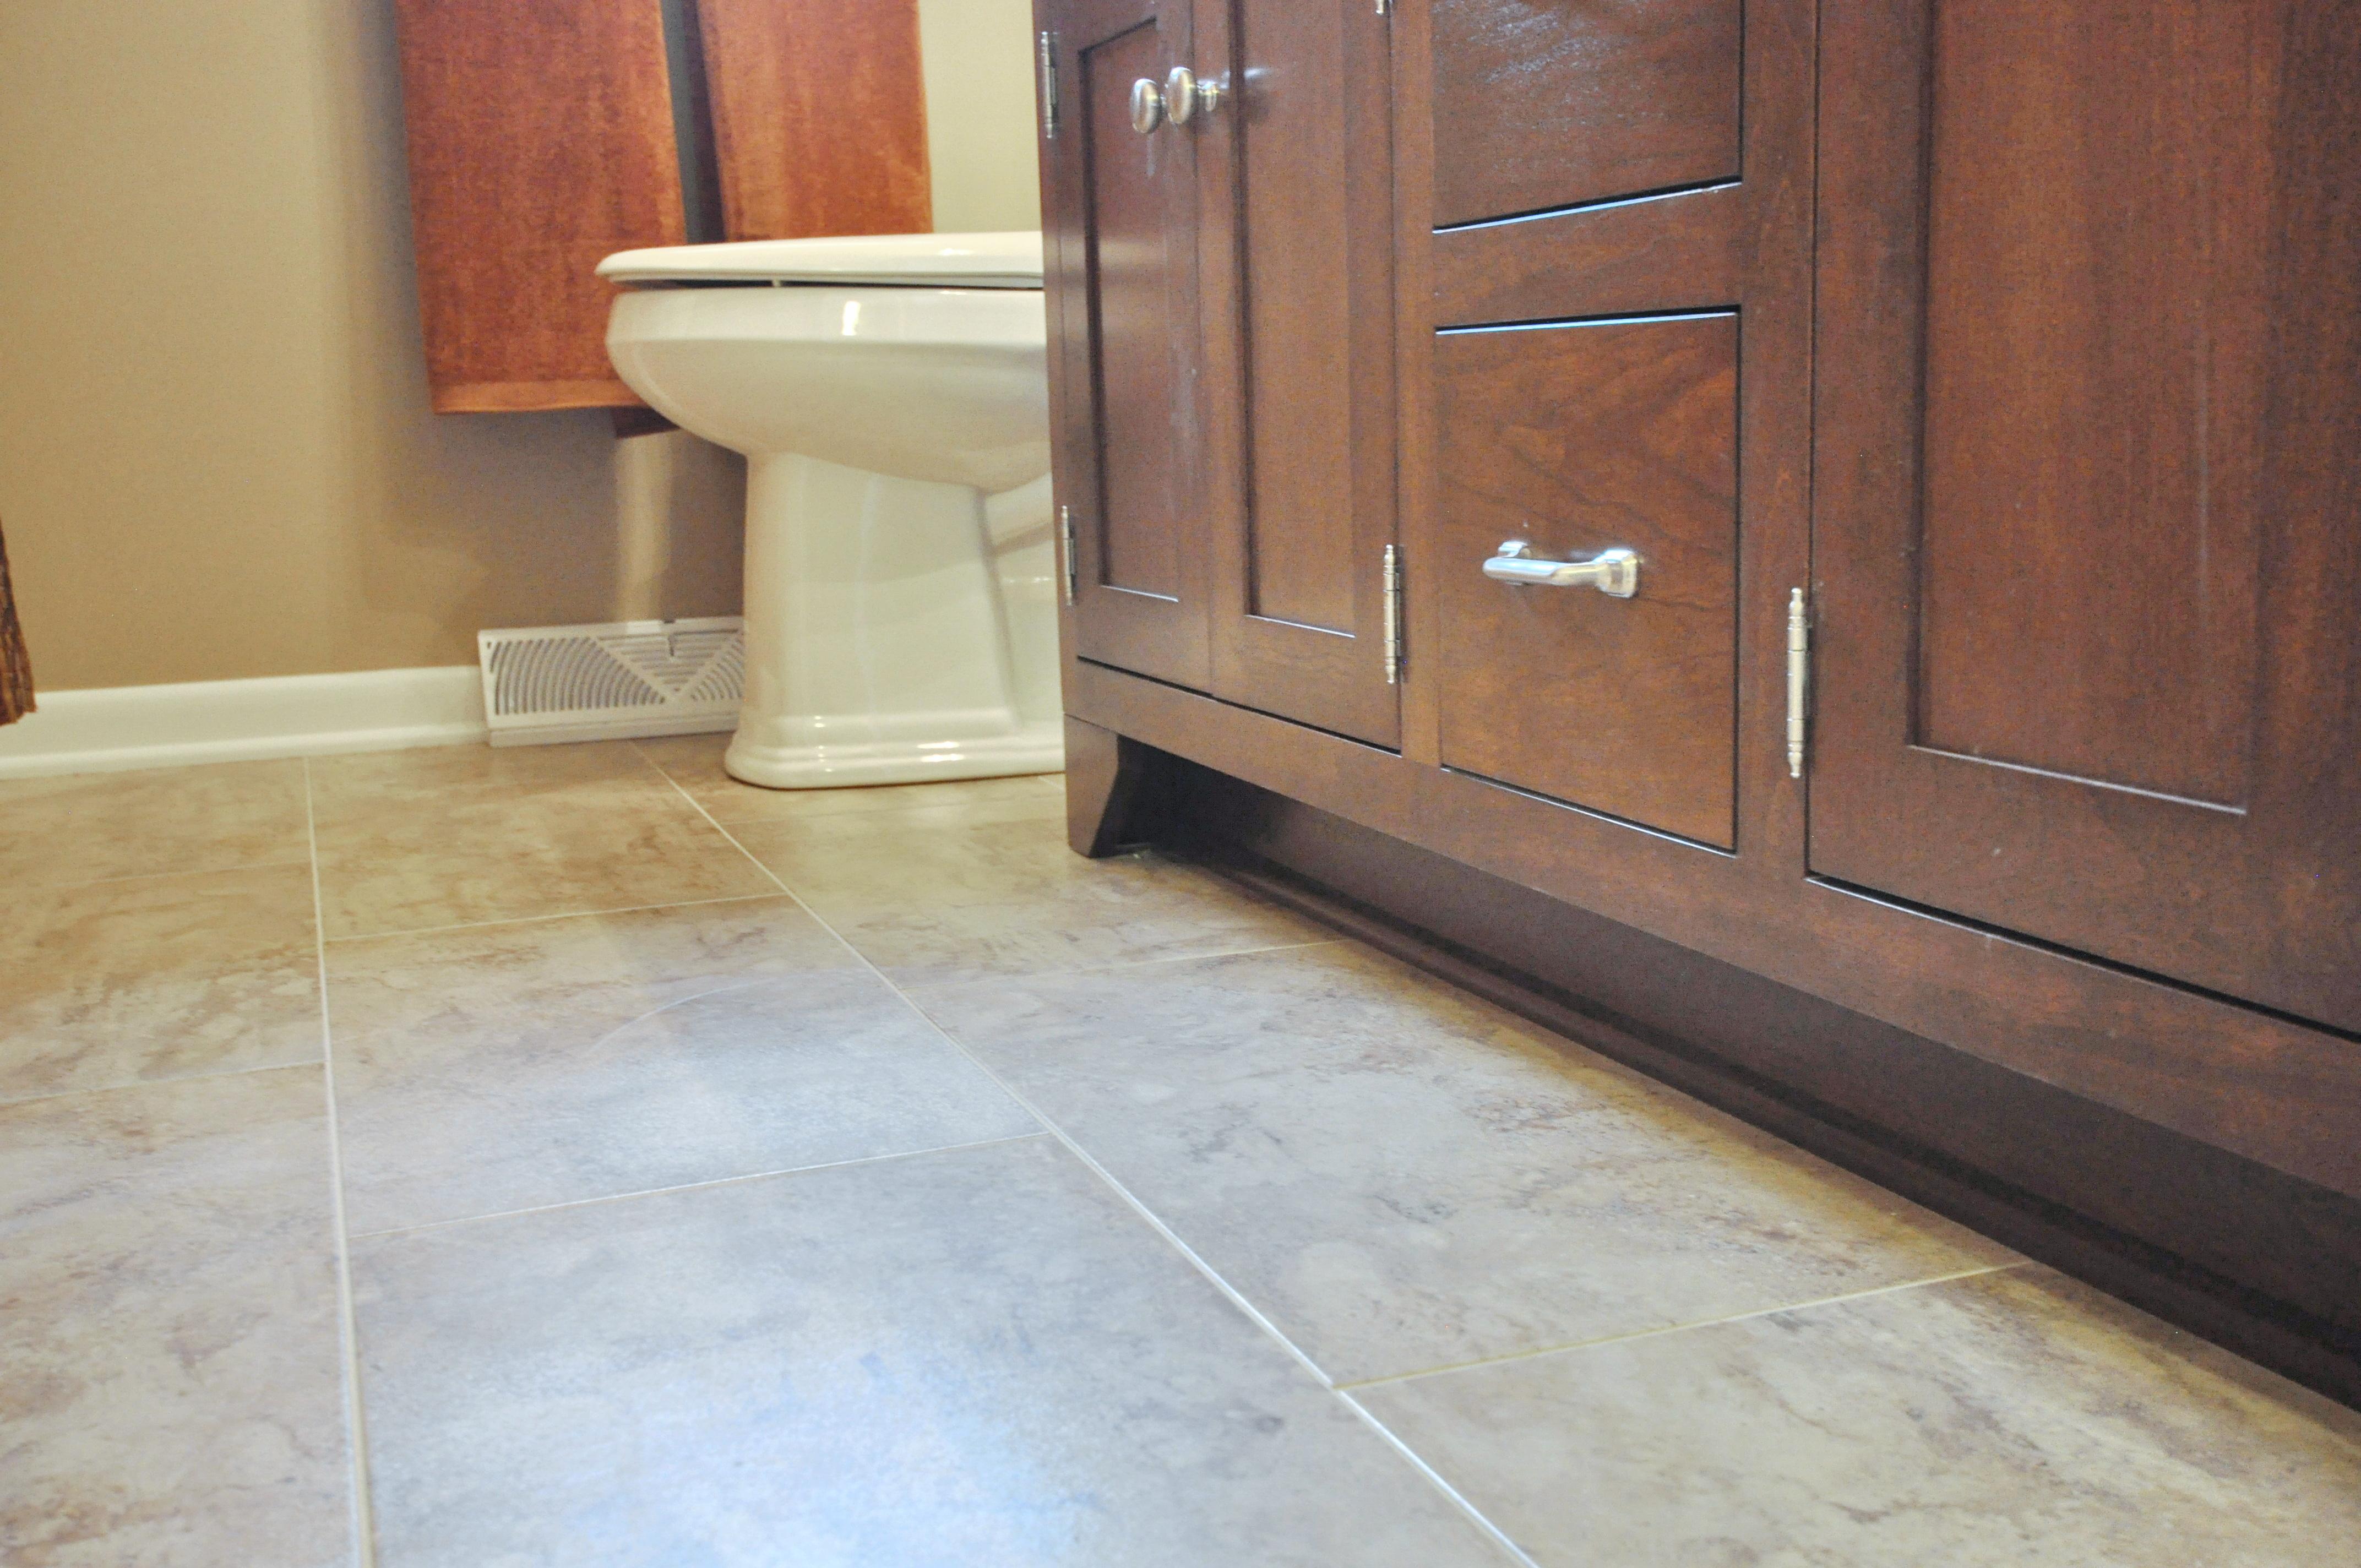 Grouted glue-down luxury vinyl tile